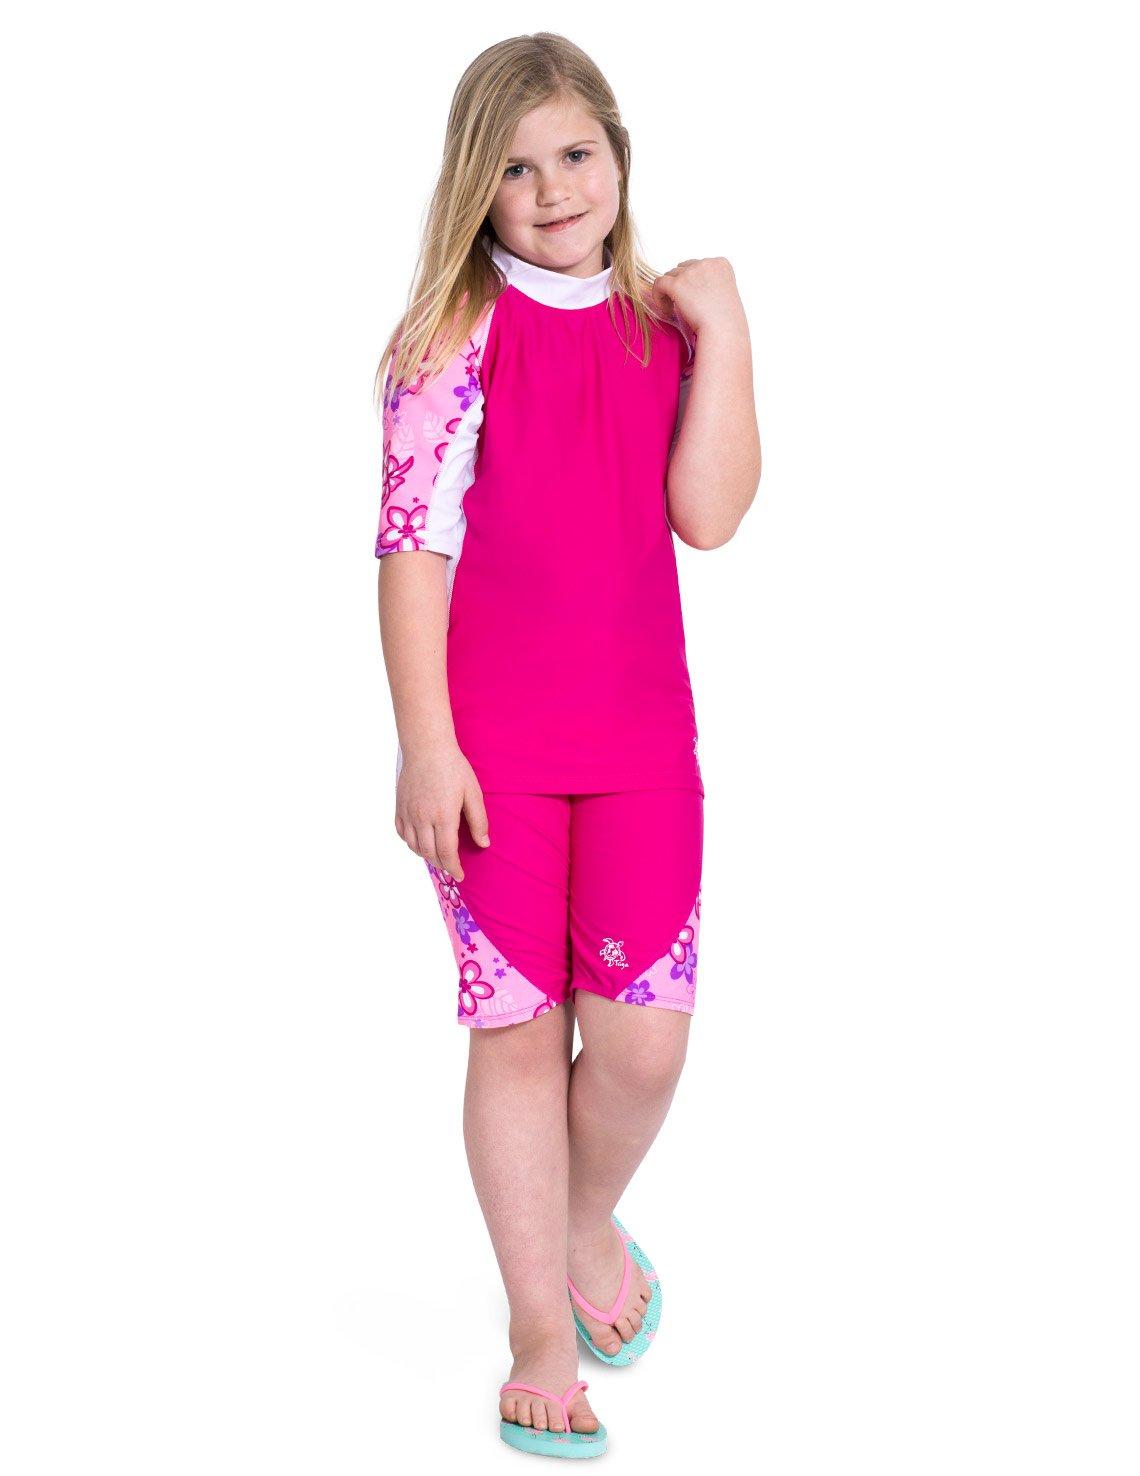 TUGA Sunwear Shoreline Swim shirt Long-Sleeved